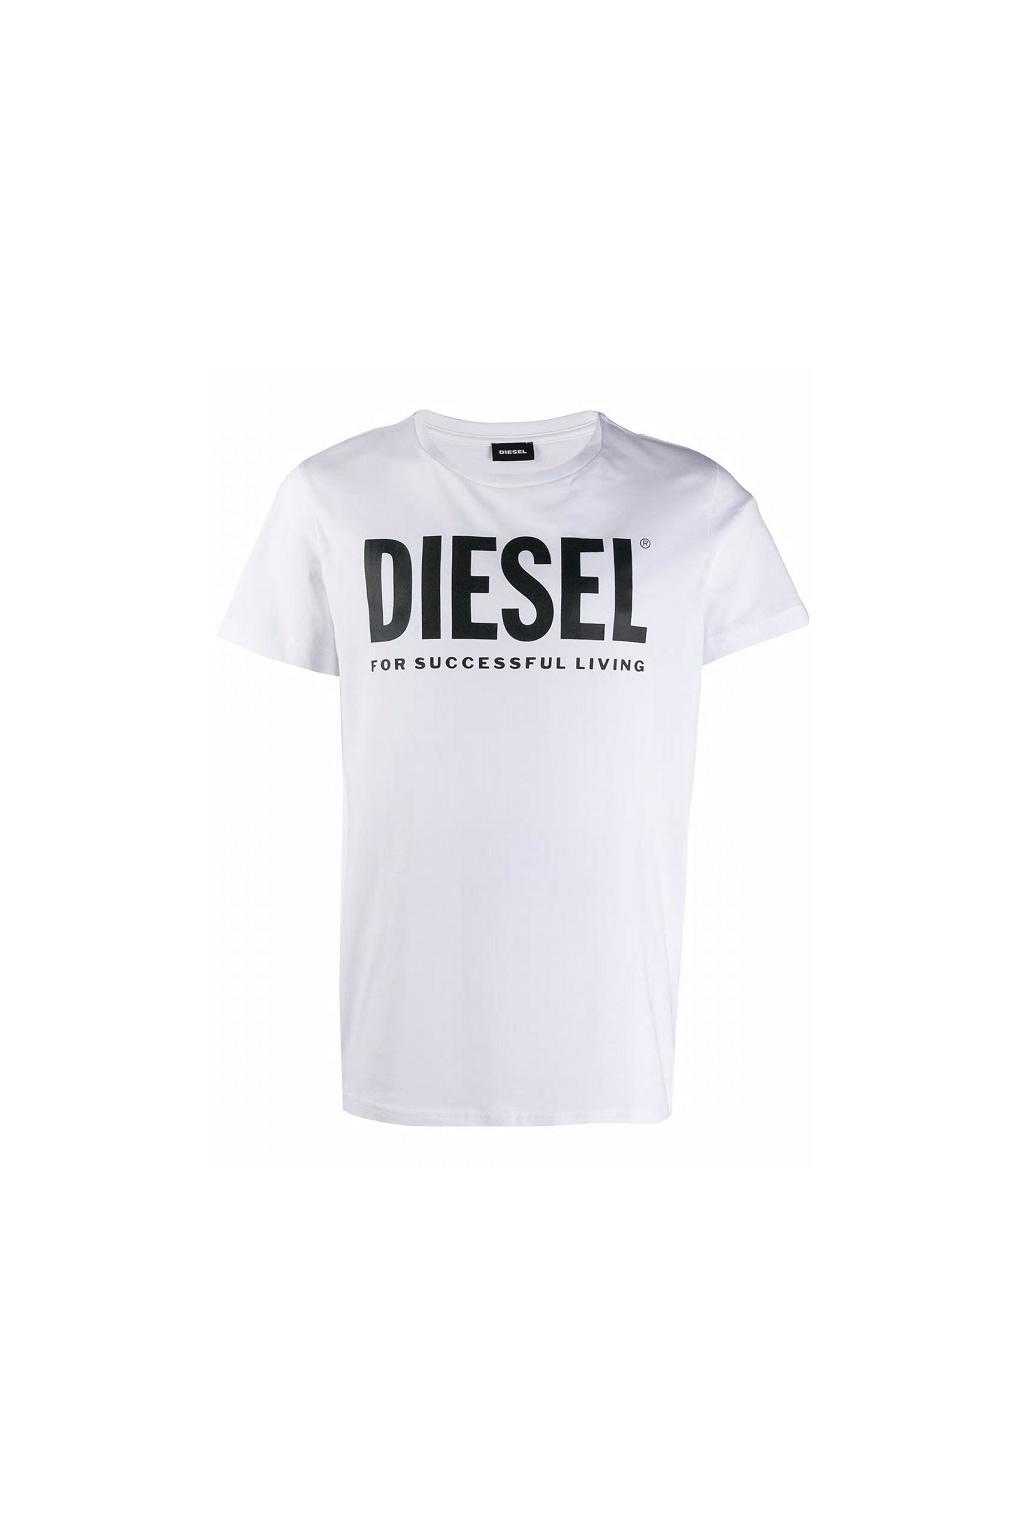 00SXED 0AAXJ Pánské Diesel tričko T Diego Logo bílé